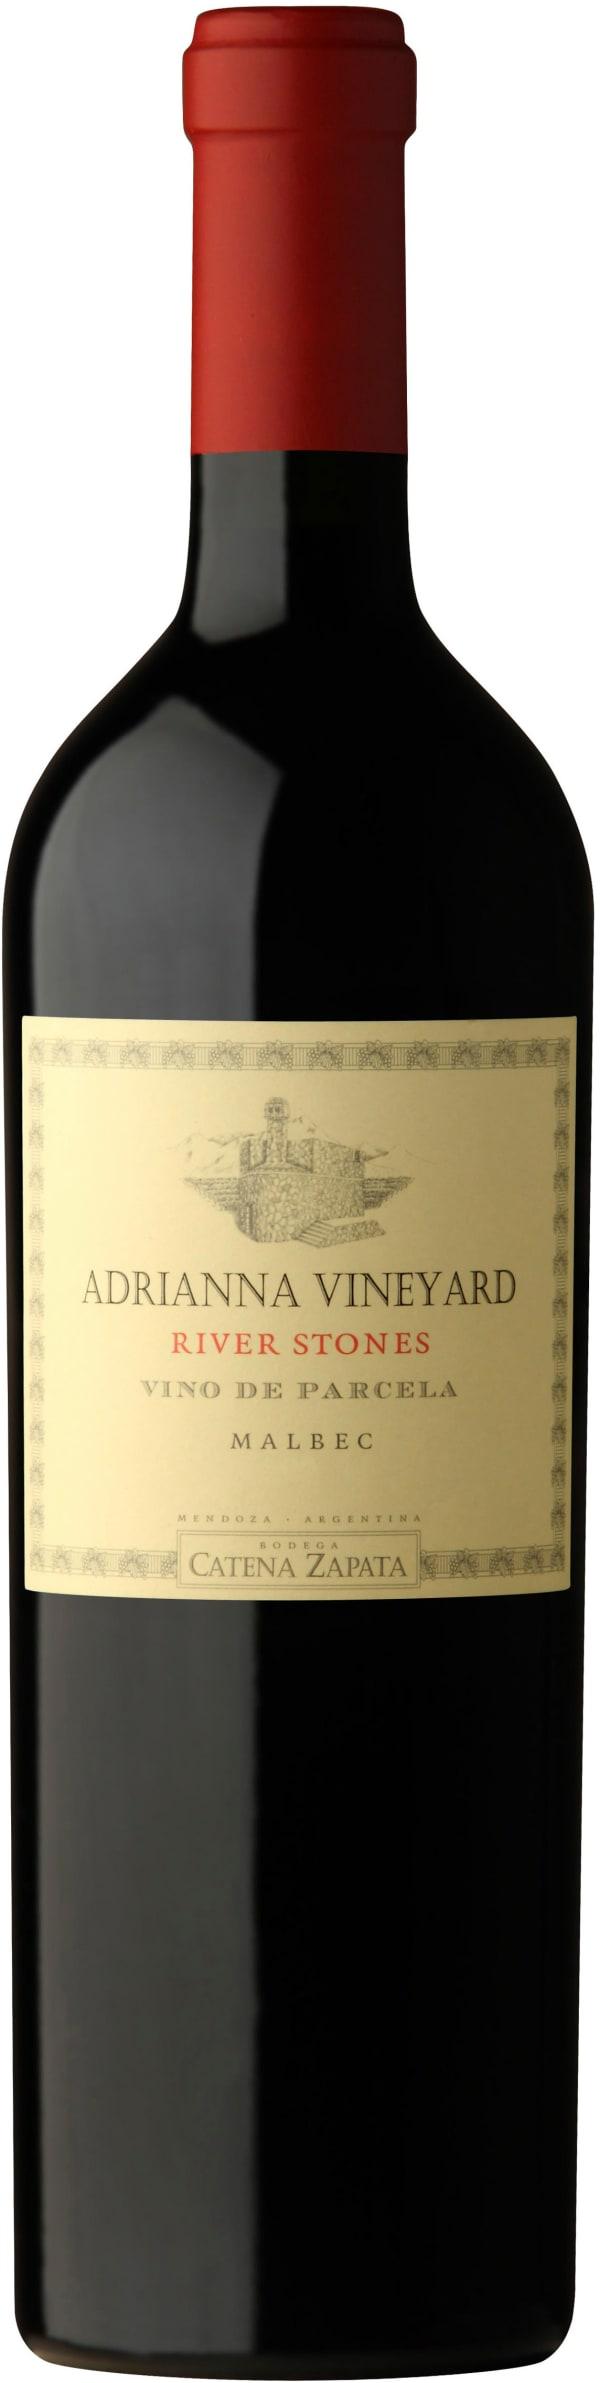 Adrianna Vineyard River Stones Malbec 2016